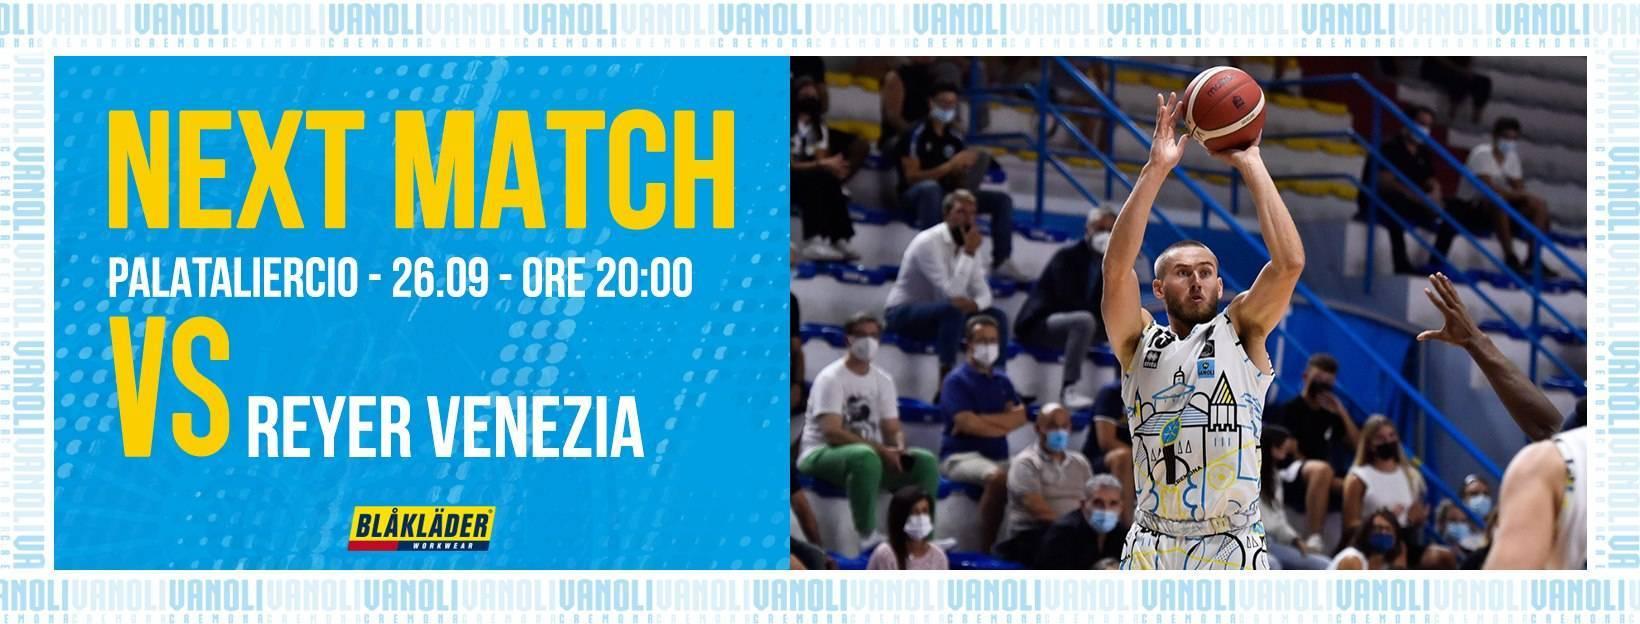 LBA UnipolSai preview 1^ andata 2021-22: esordio complesso per la Vanoli Cremona al Taliercio vs l'Umana Reyer Venezia